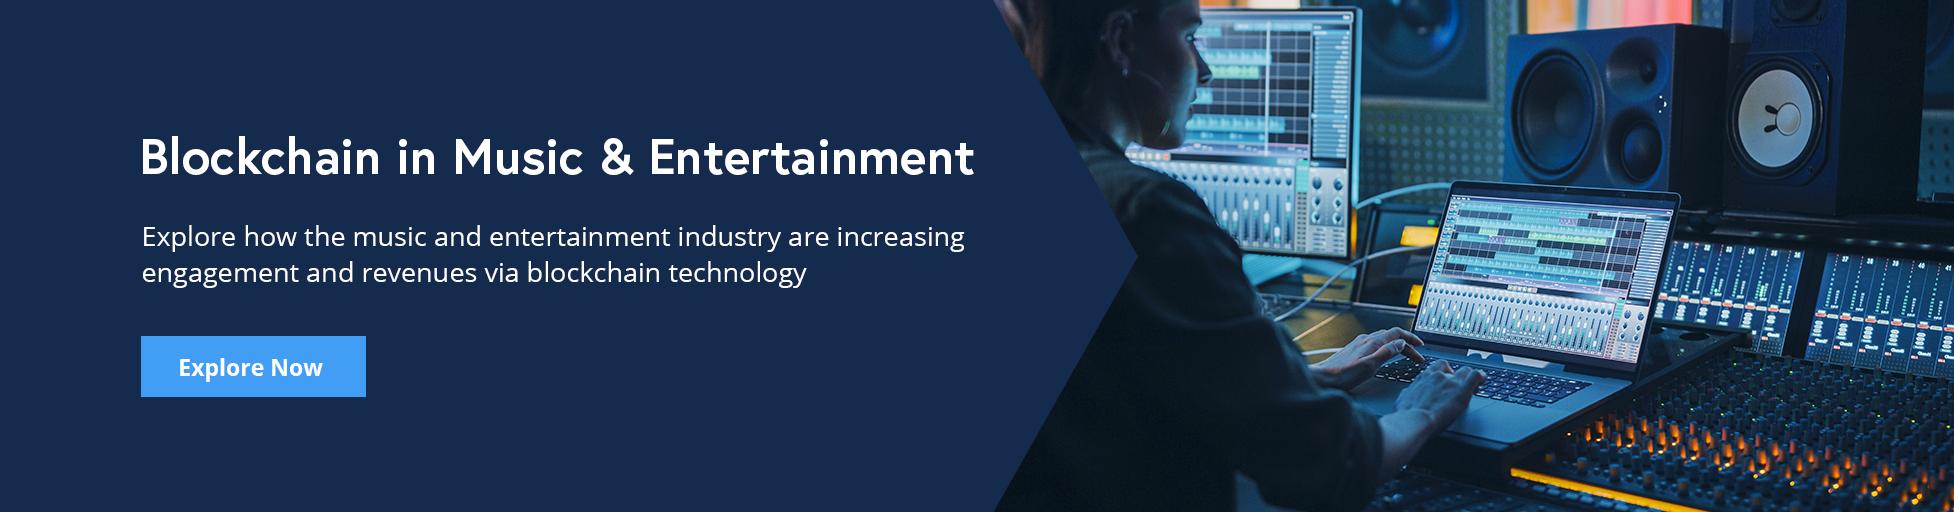 Blockchain in Music & Entertainment